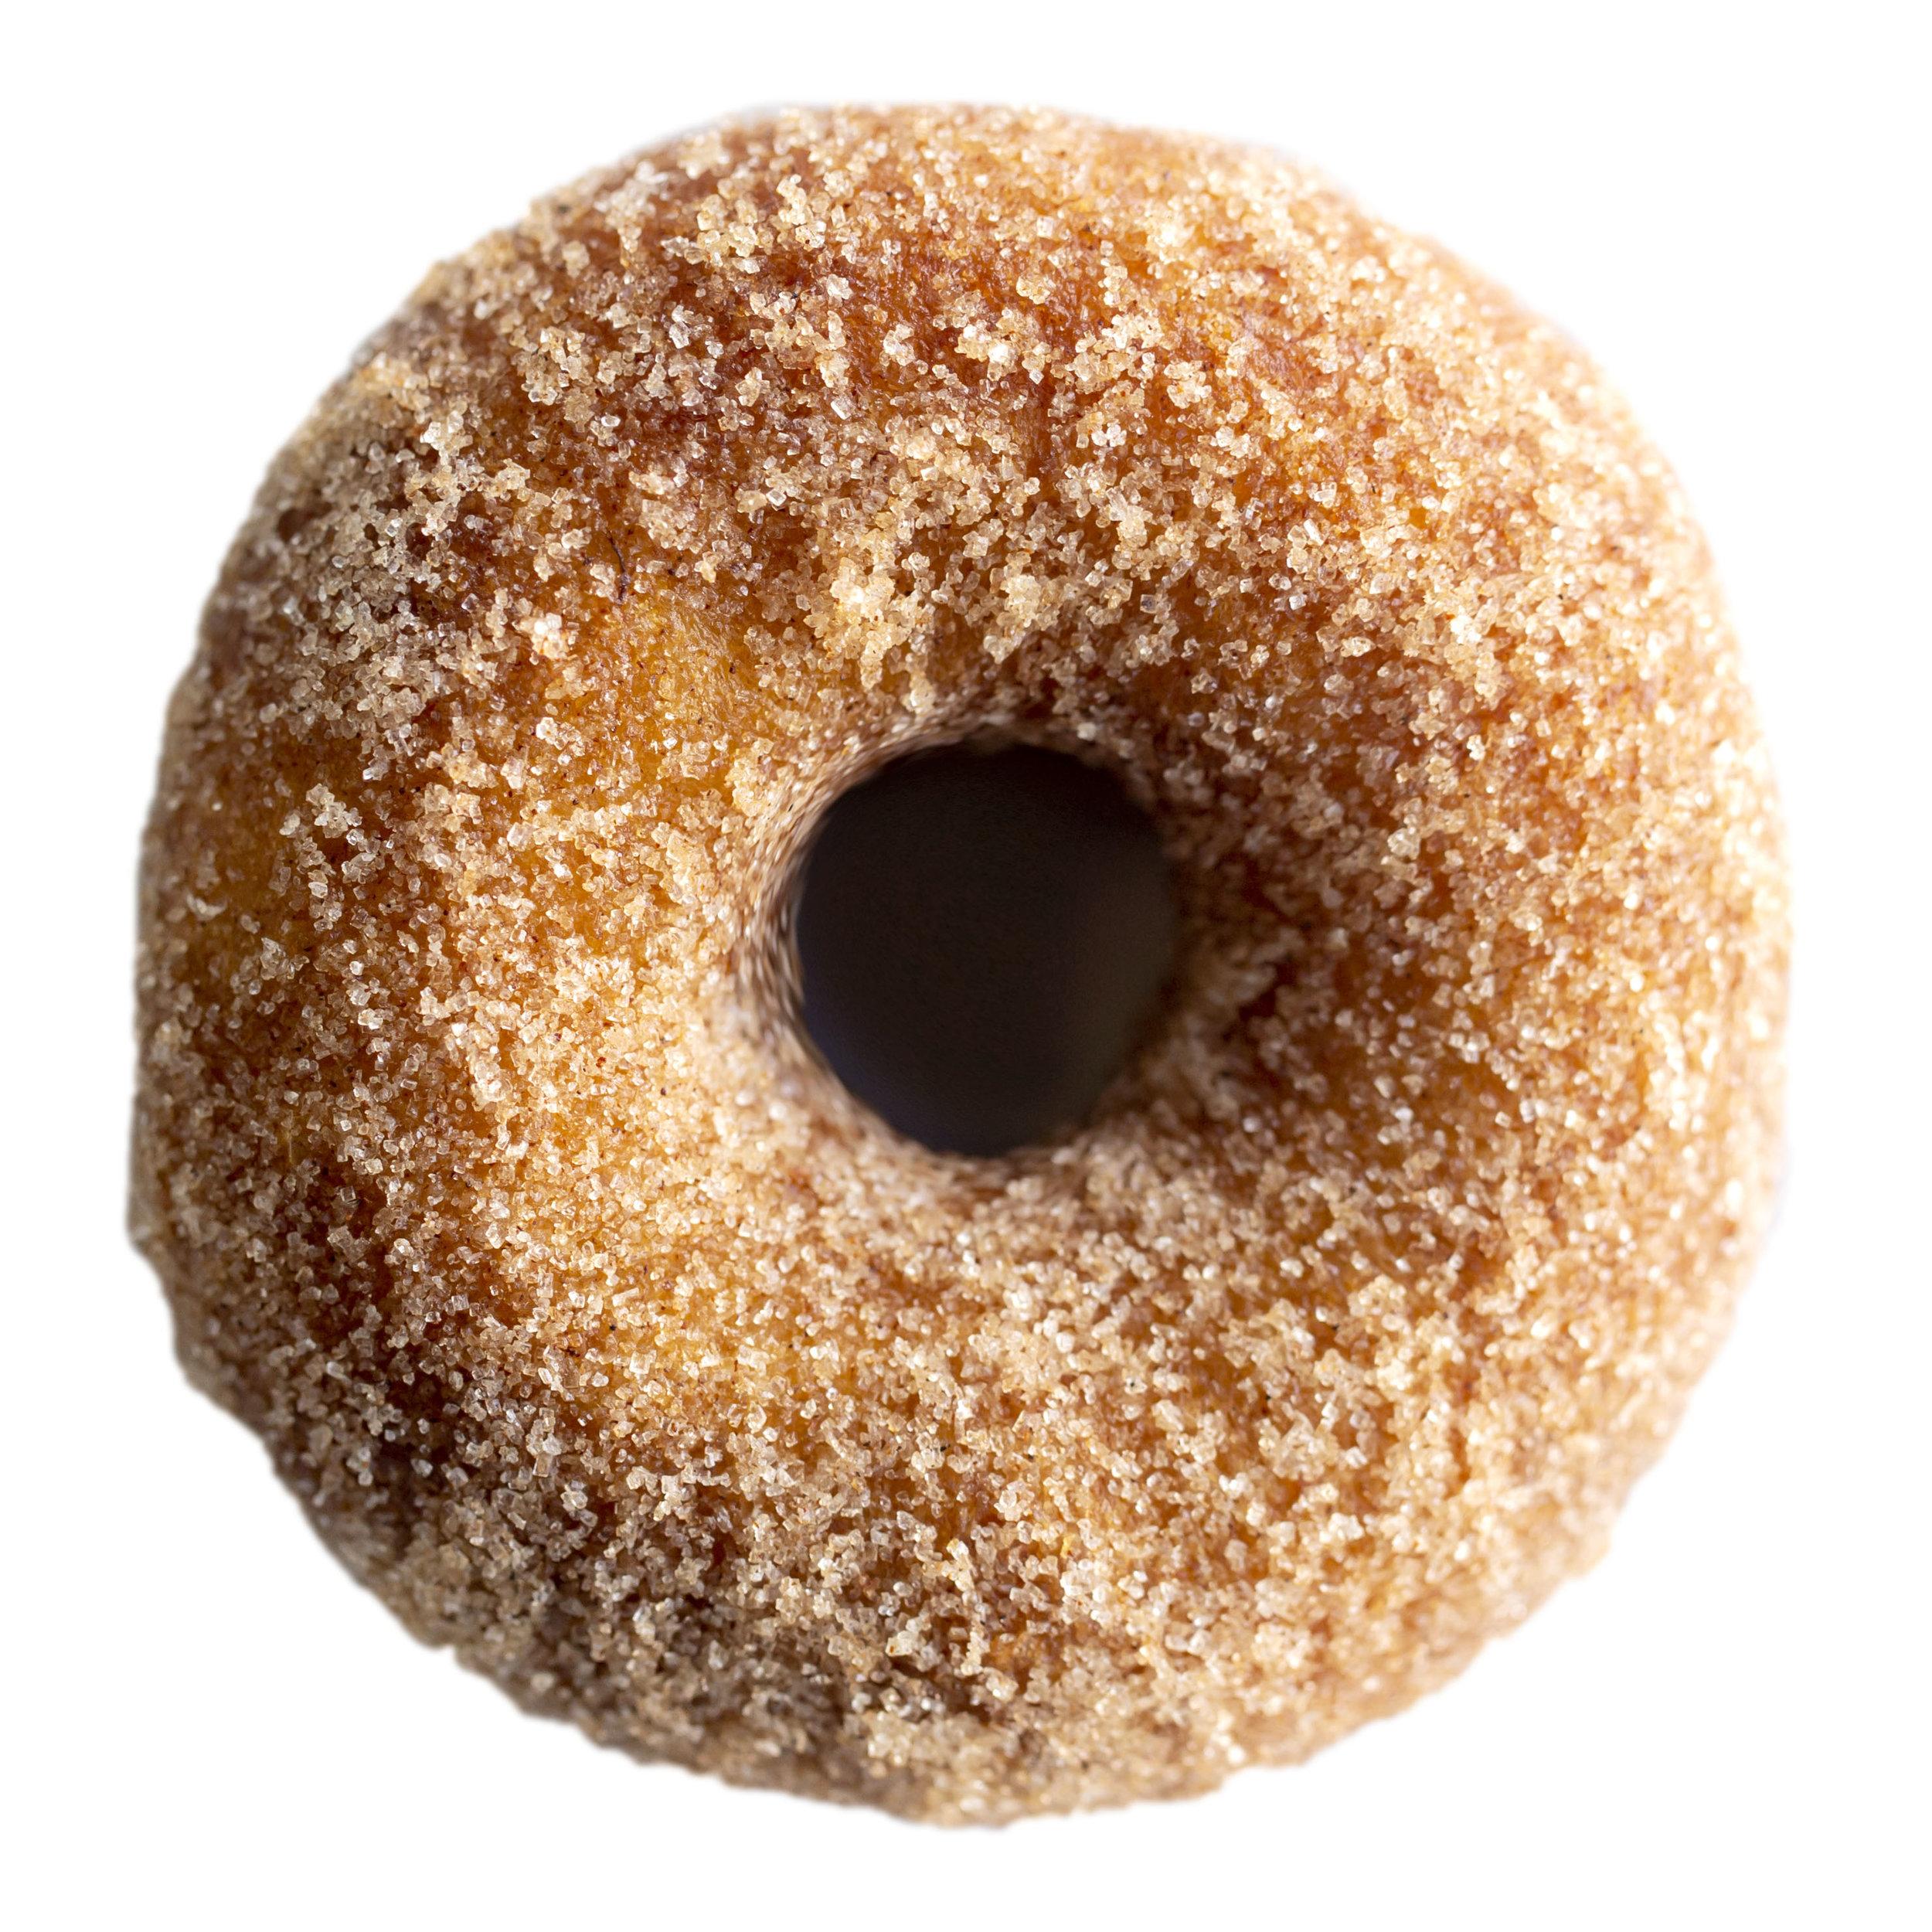 Vegan Cinnamon Sugar -